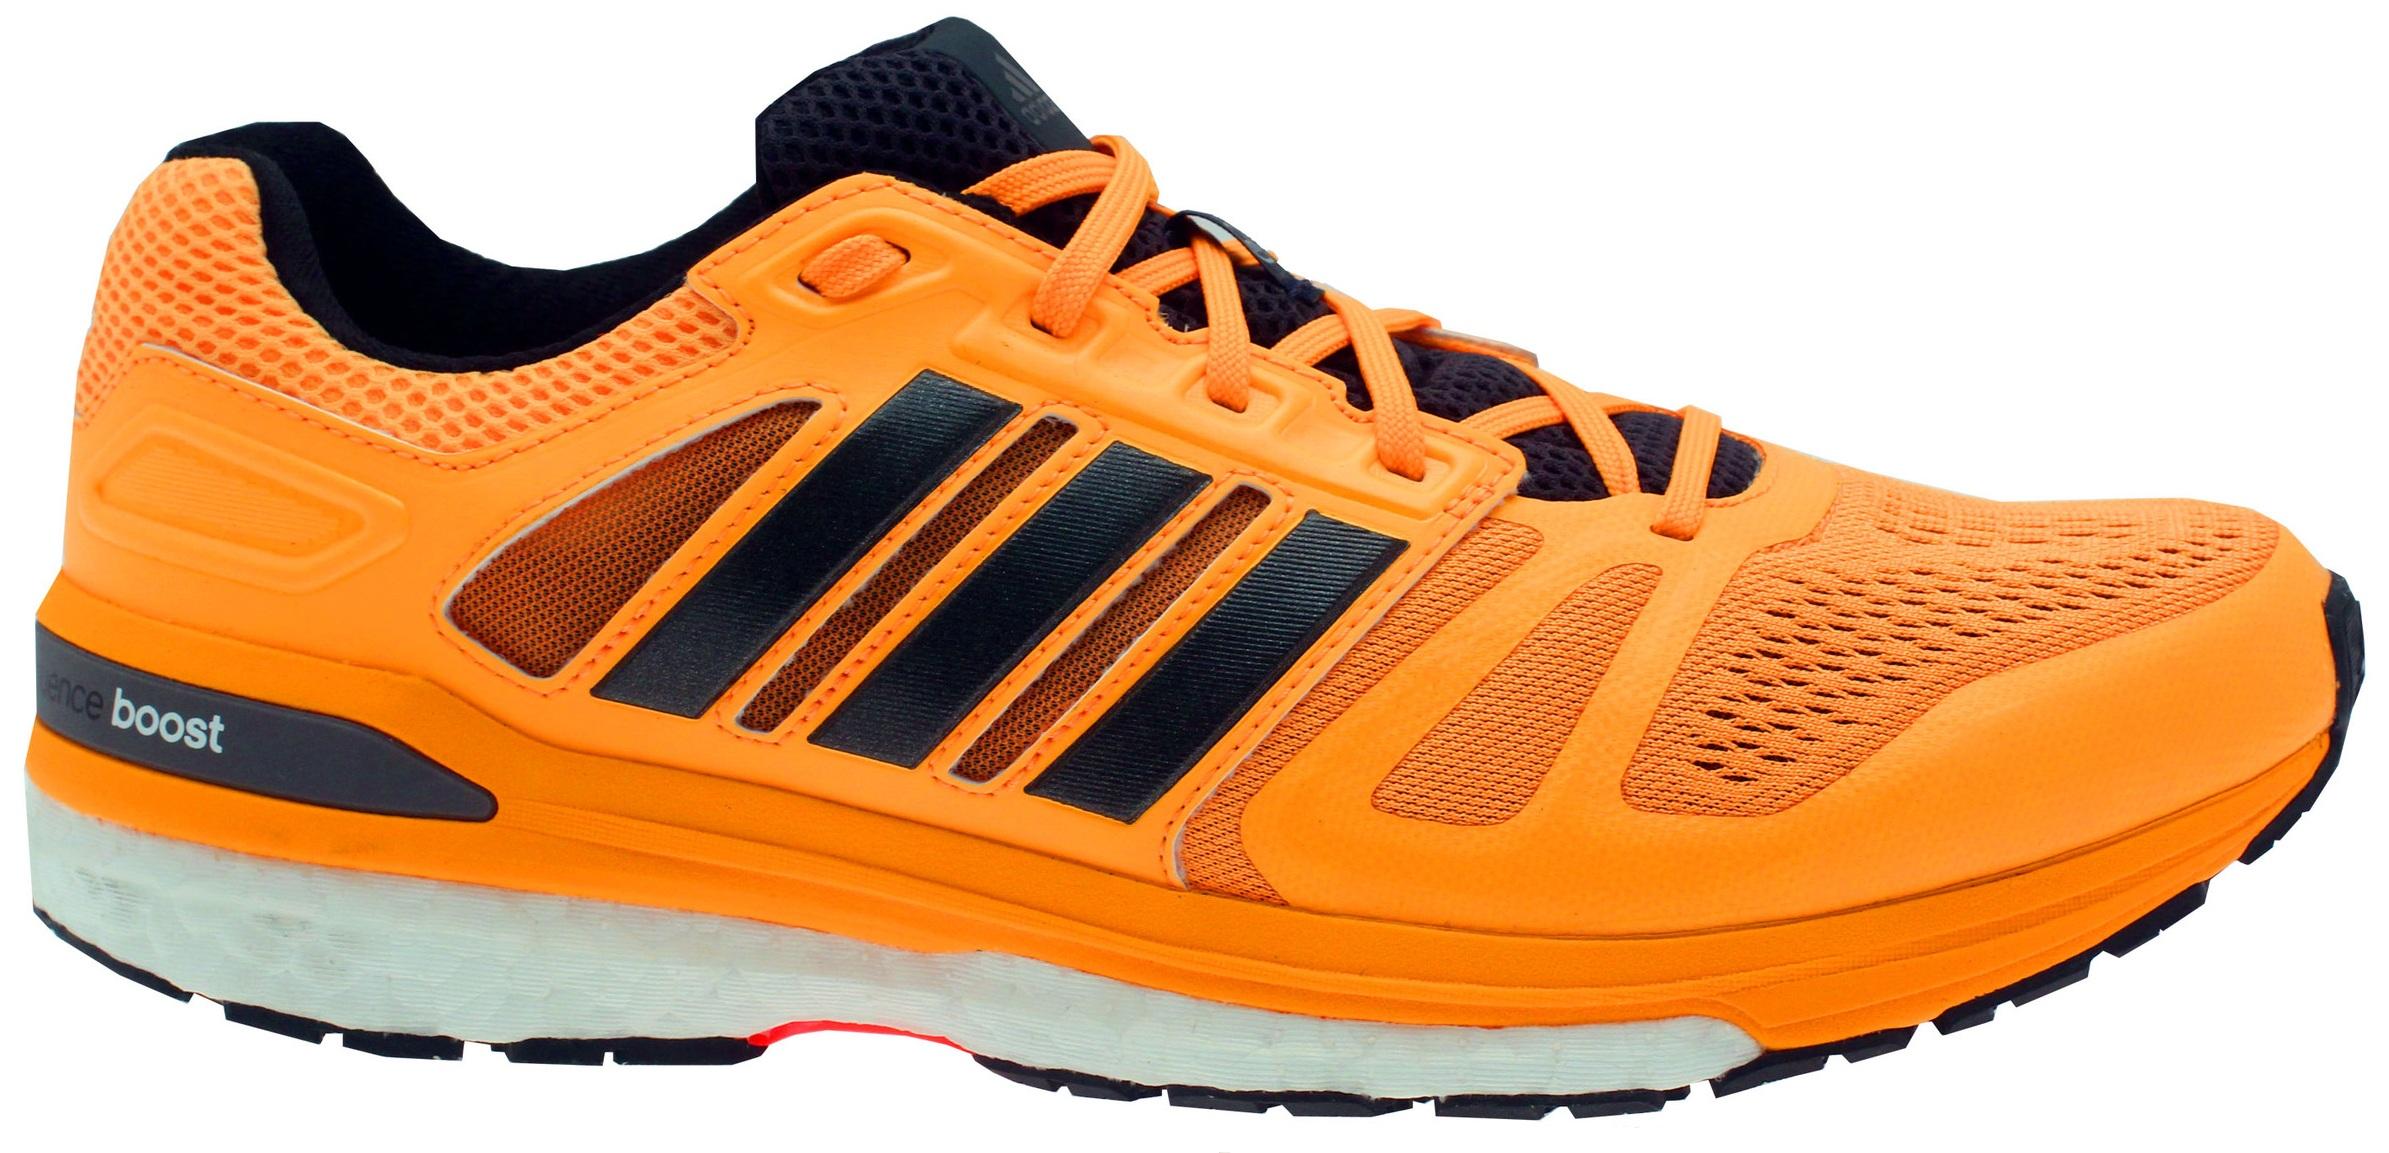 adidas-supernova-boost-sequence-7